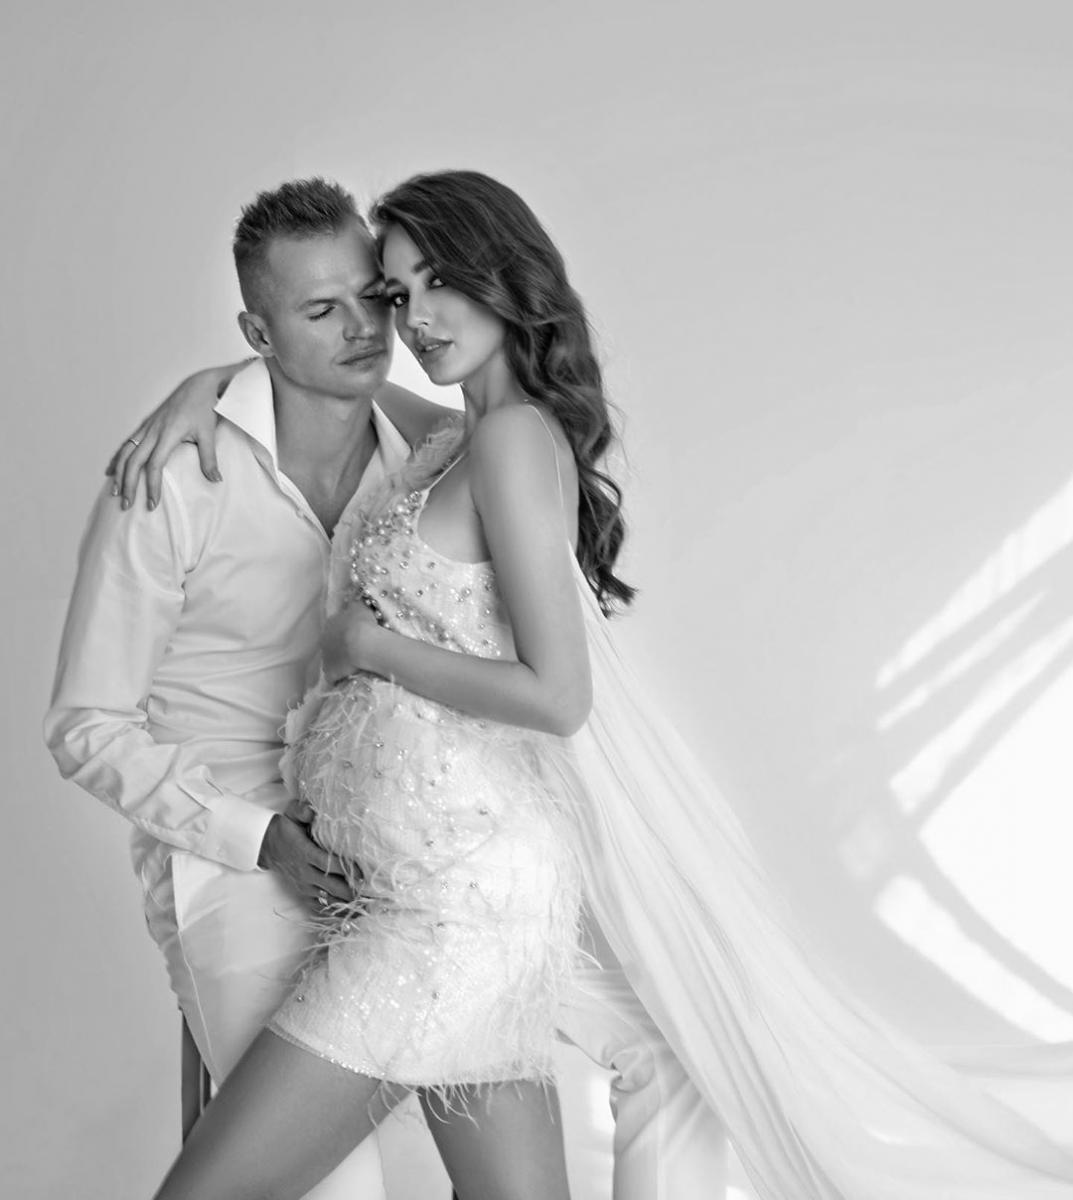 Дмитрий Тарасов и Анастасия Тарасова